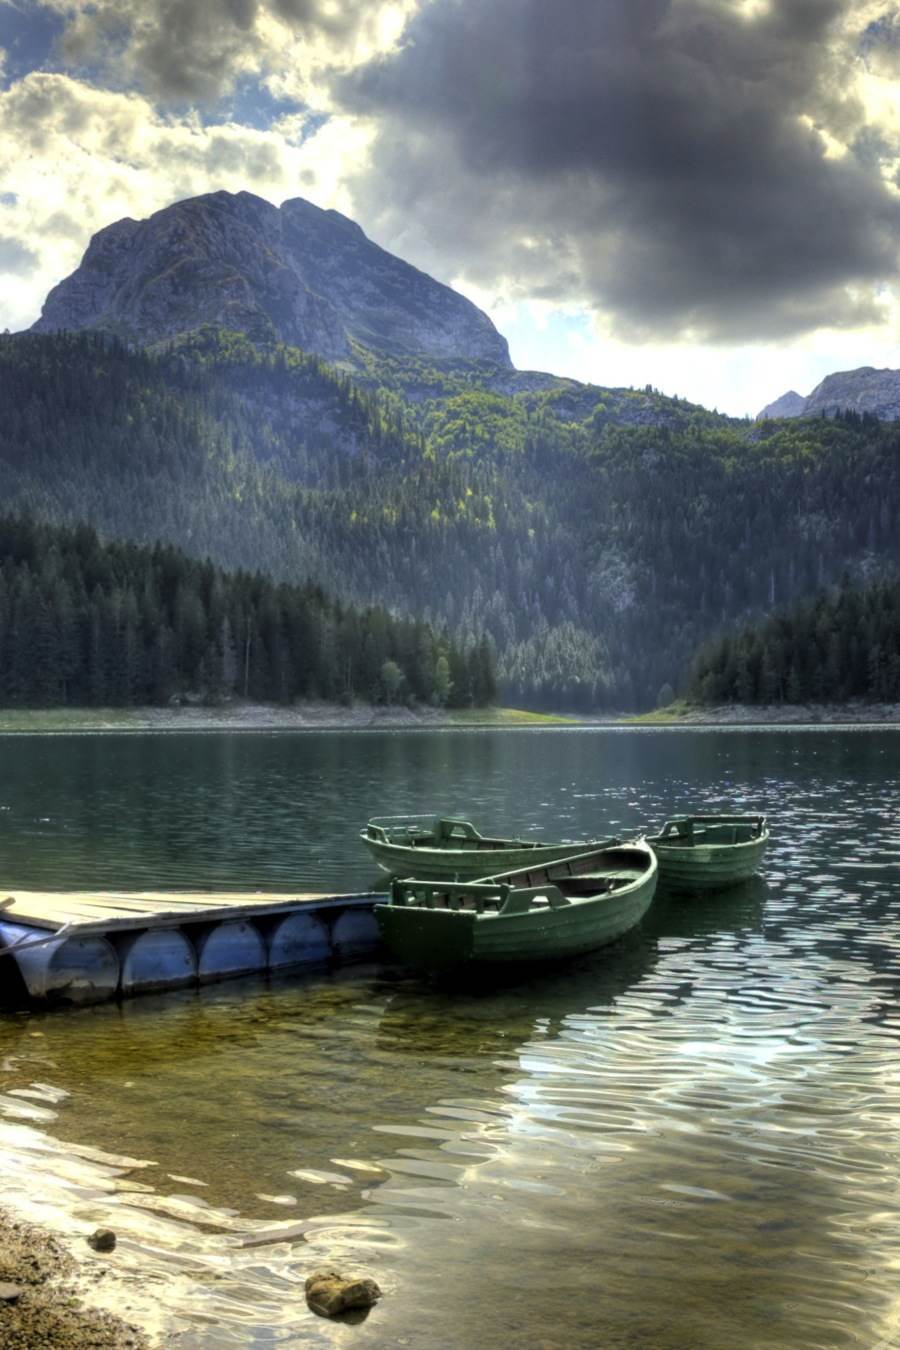 18 european natural wonders to reignite your wanderlust